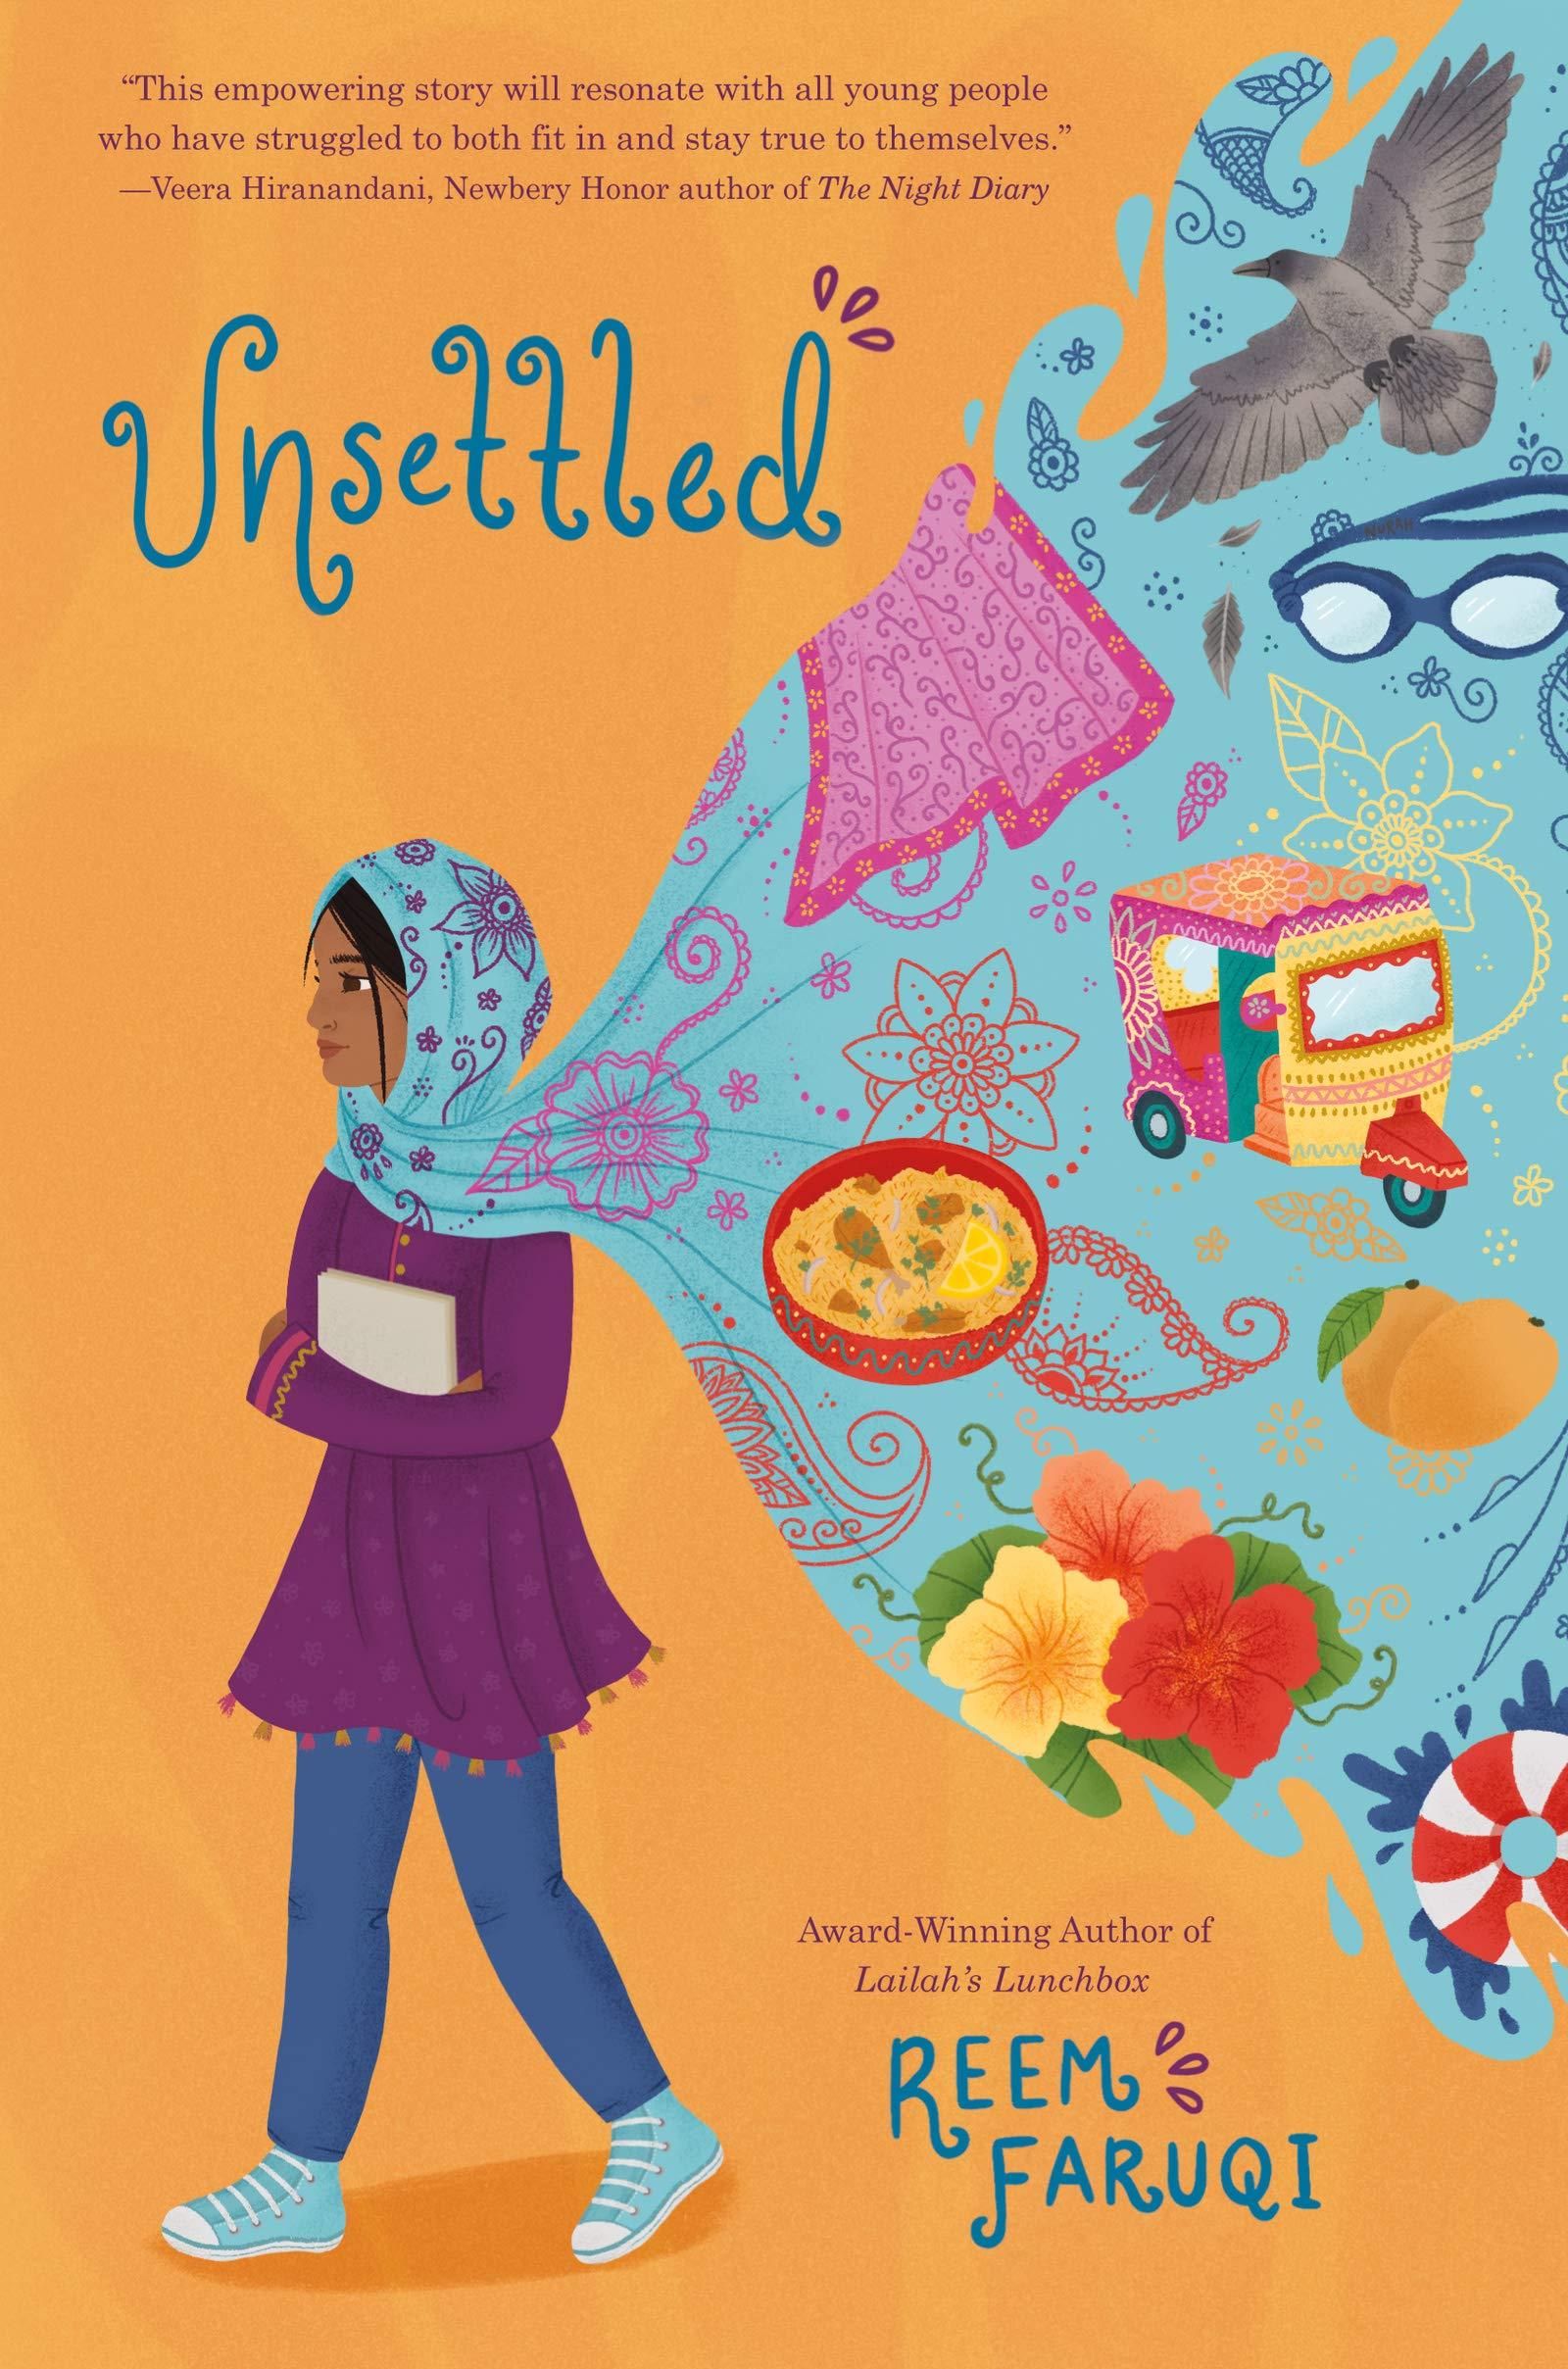 Amazon.com: Unsettled (9780063044708): Faruqi, Reem: Books